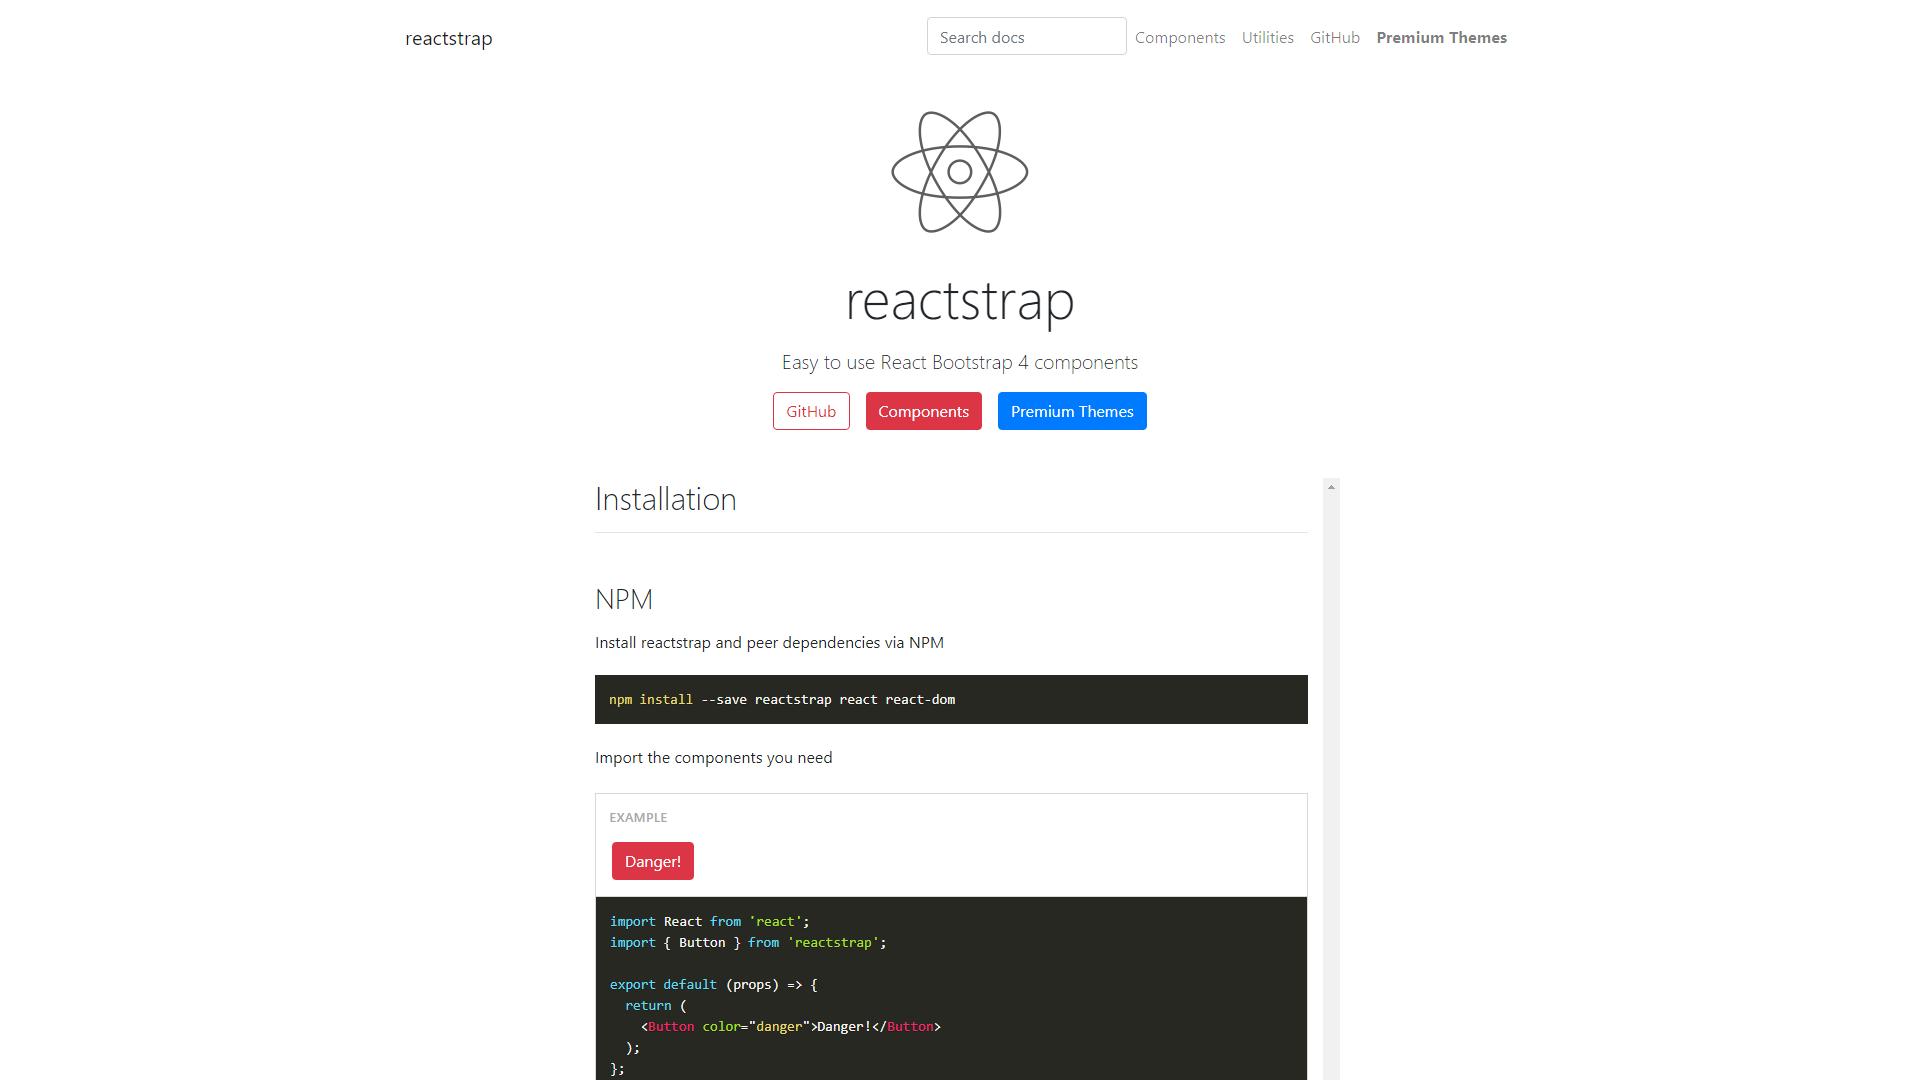 Reactstrap ReactJS UI Frameworks